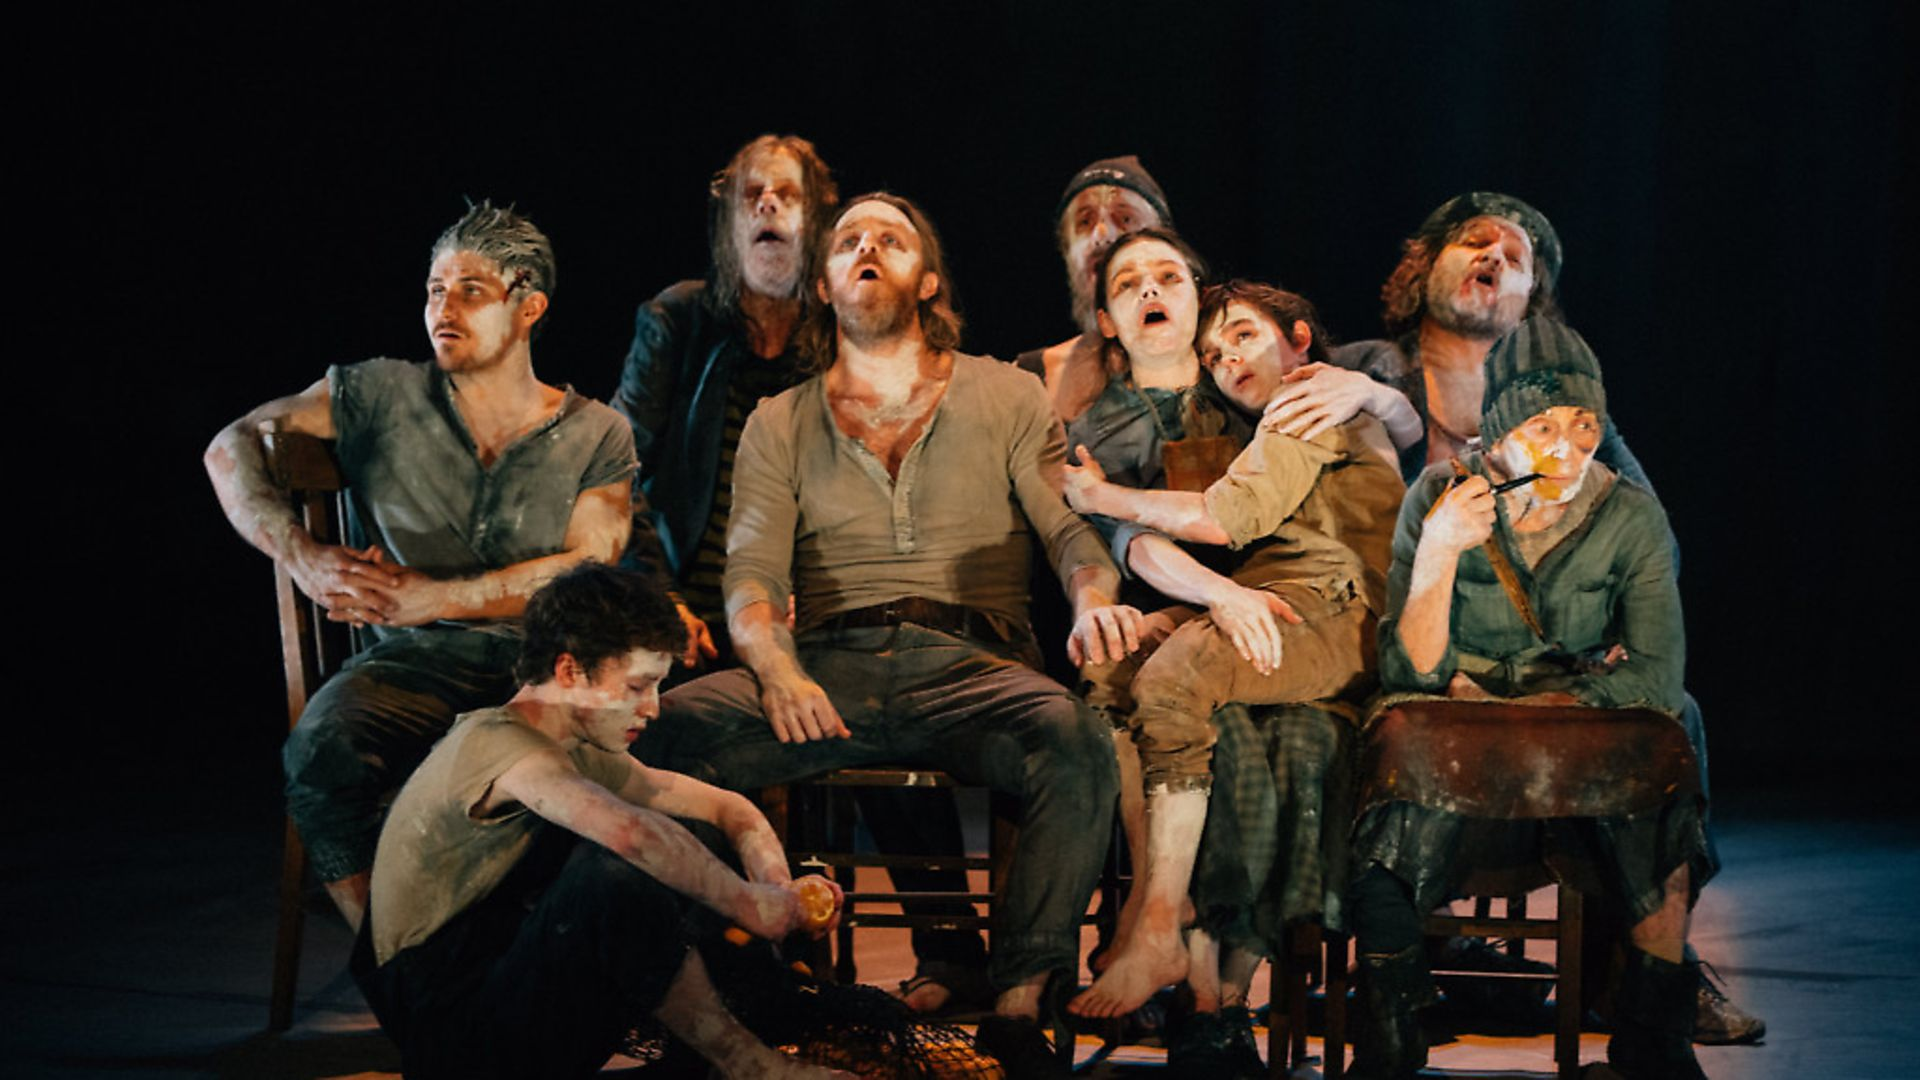 Members of the cast of 'The Secret River', a harrowing play examining British history.  Photo: Ryan Buchanan - Credit: Archant